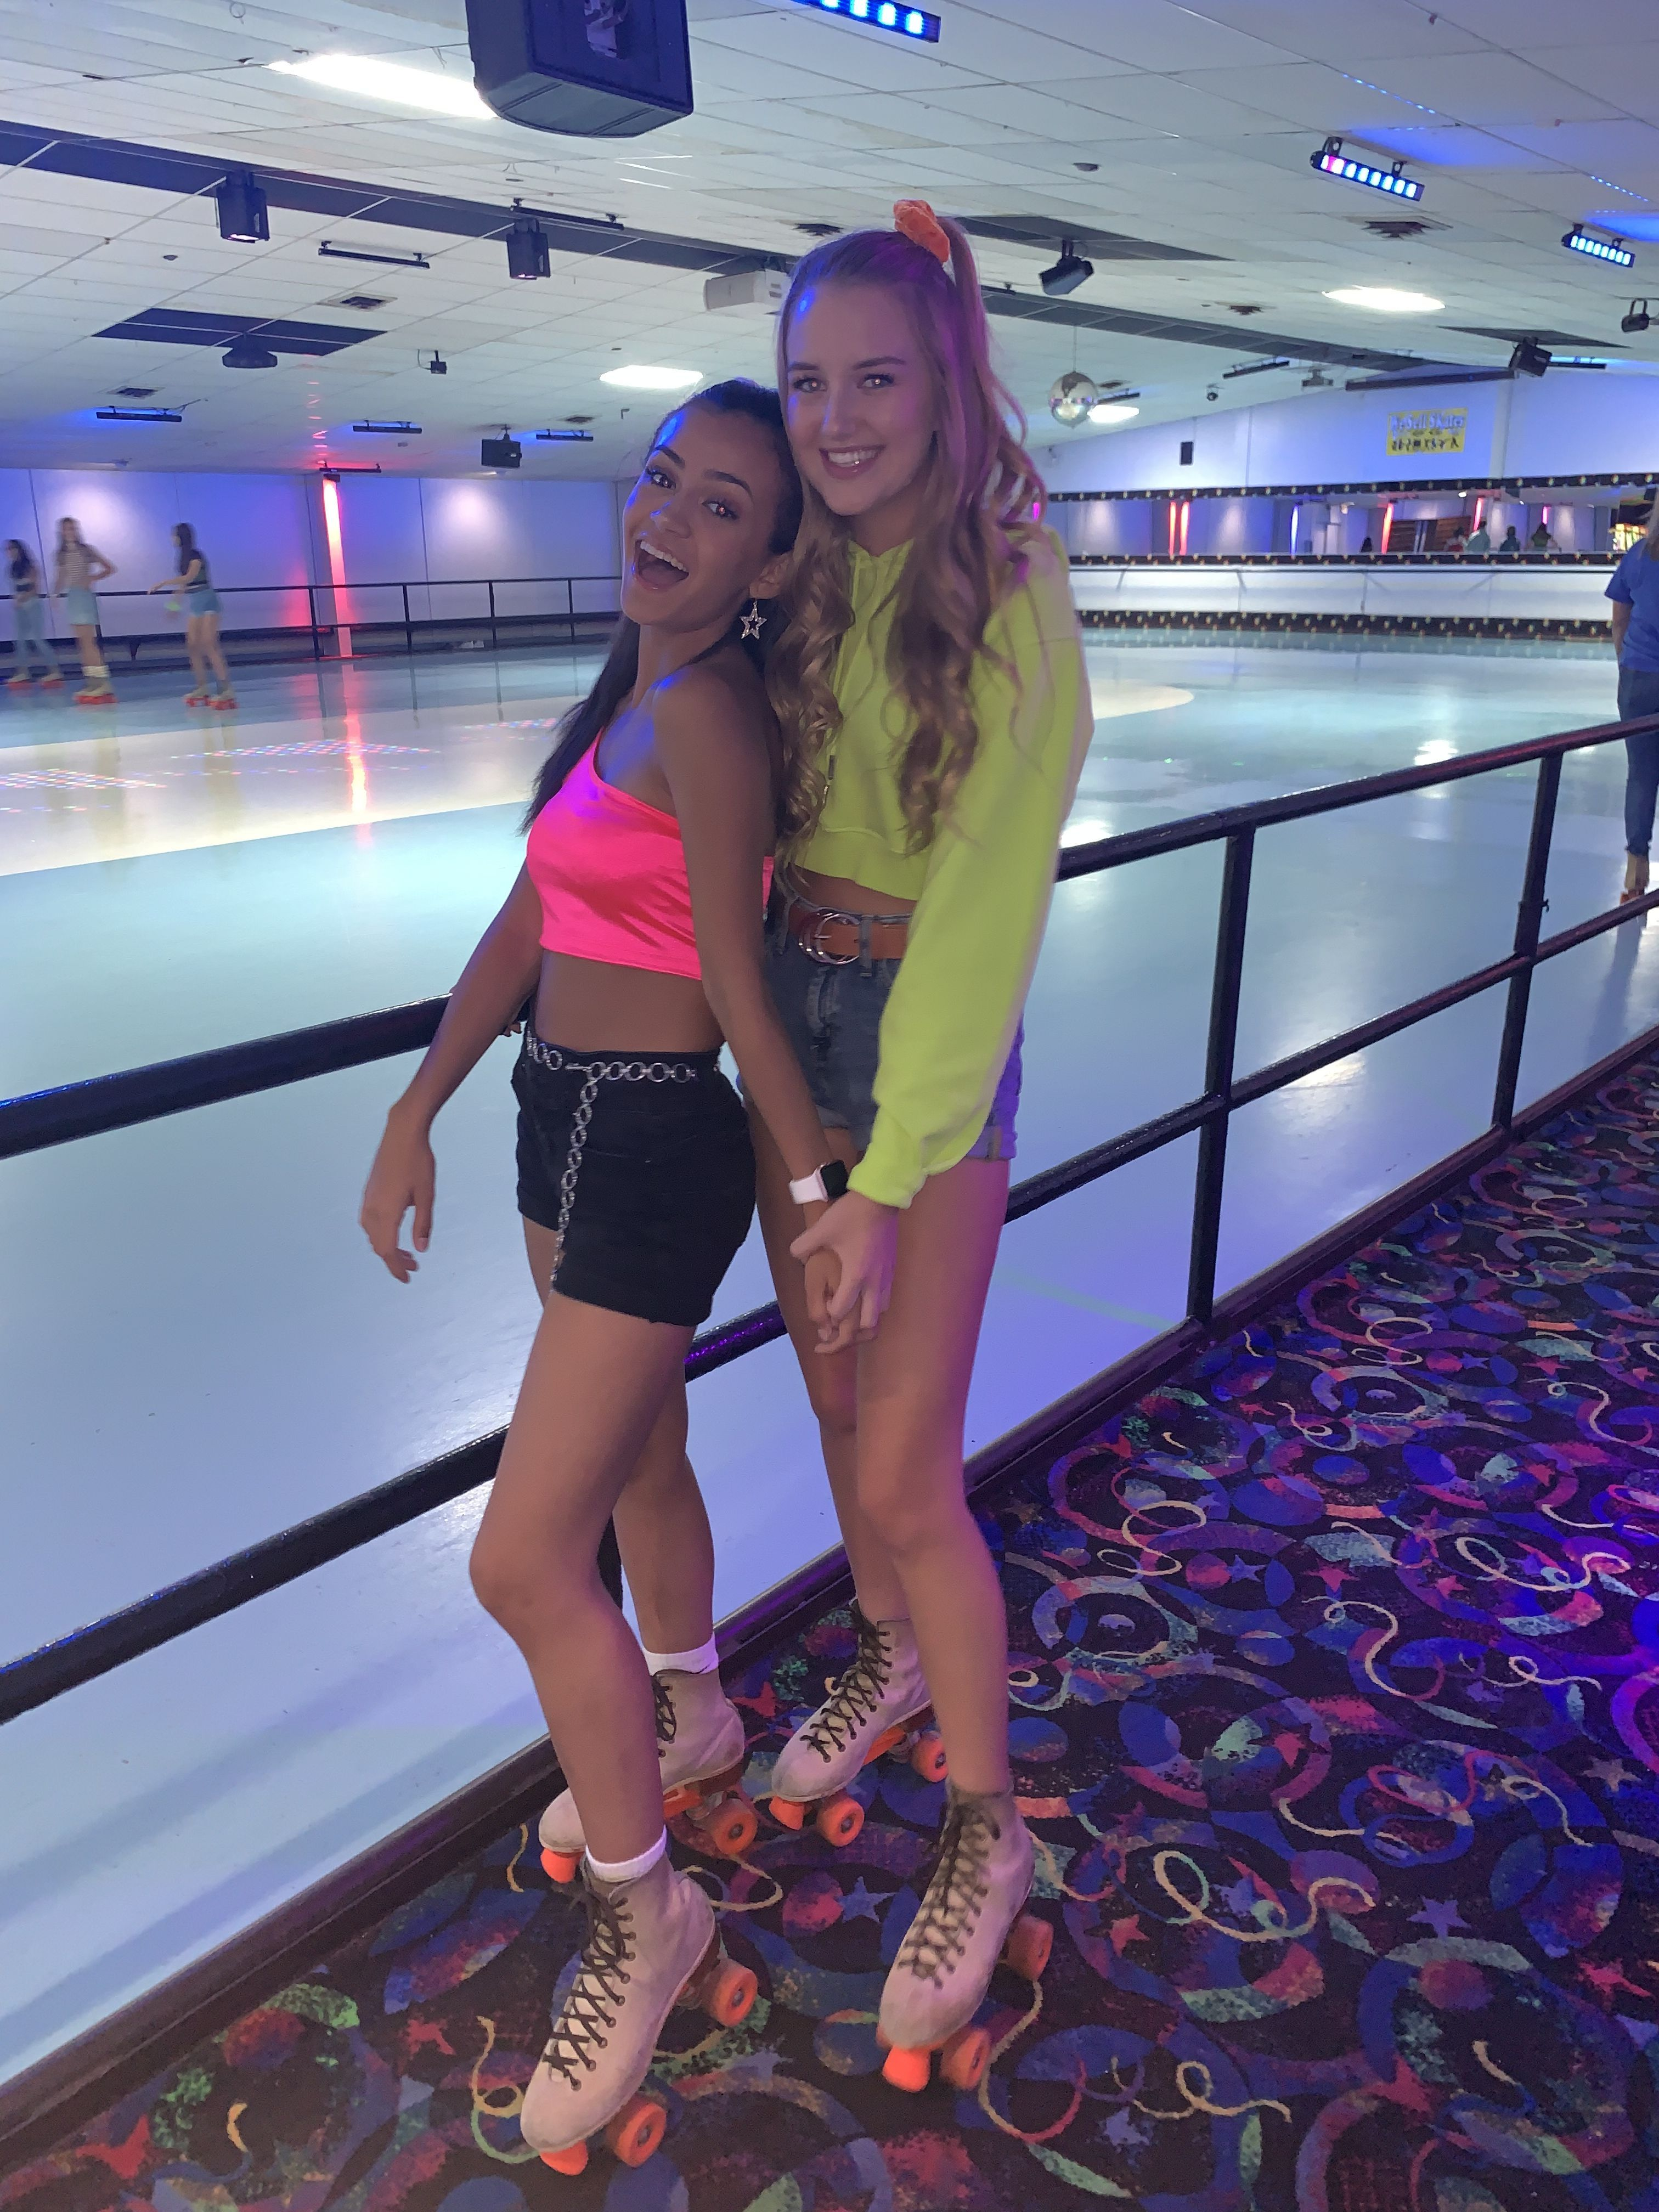 #instagram #rollerskating #rollerskates #vscoaesthetic #vsco #vscocam #80spartyoutfits  #80sparty #bestfriends #bffgoals #friendship #friendphotos #summer #summervsco #summerstyle